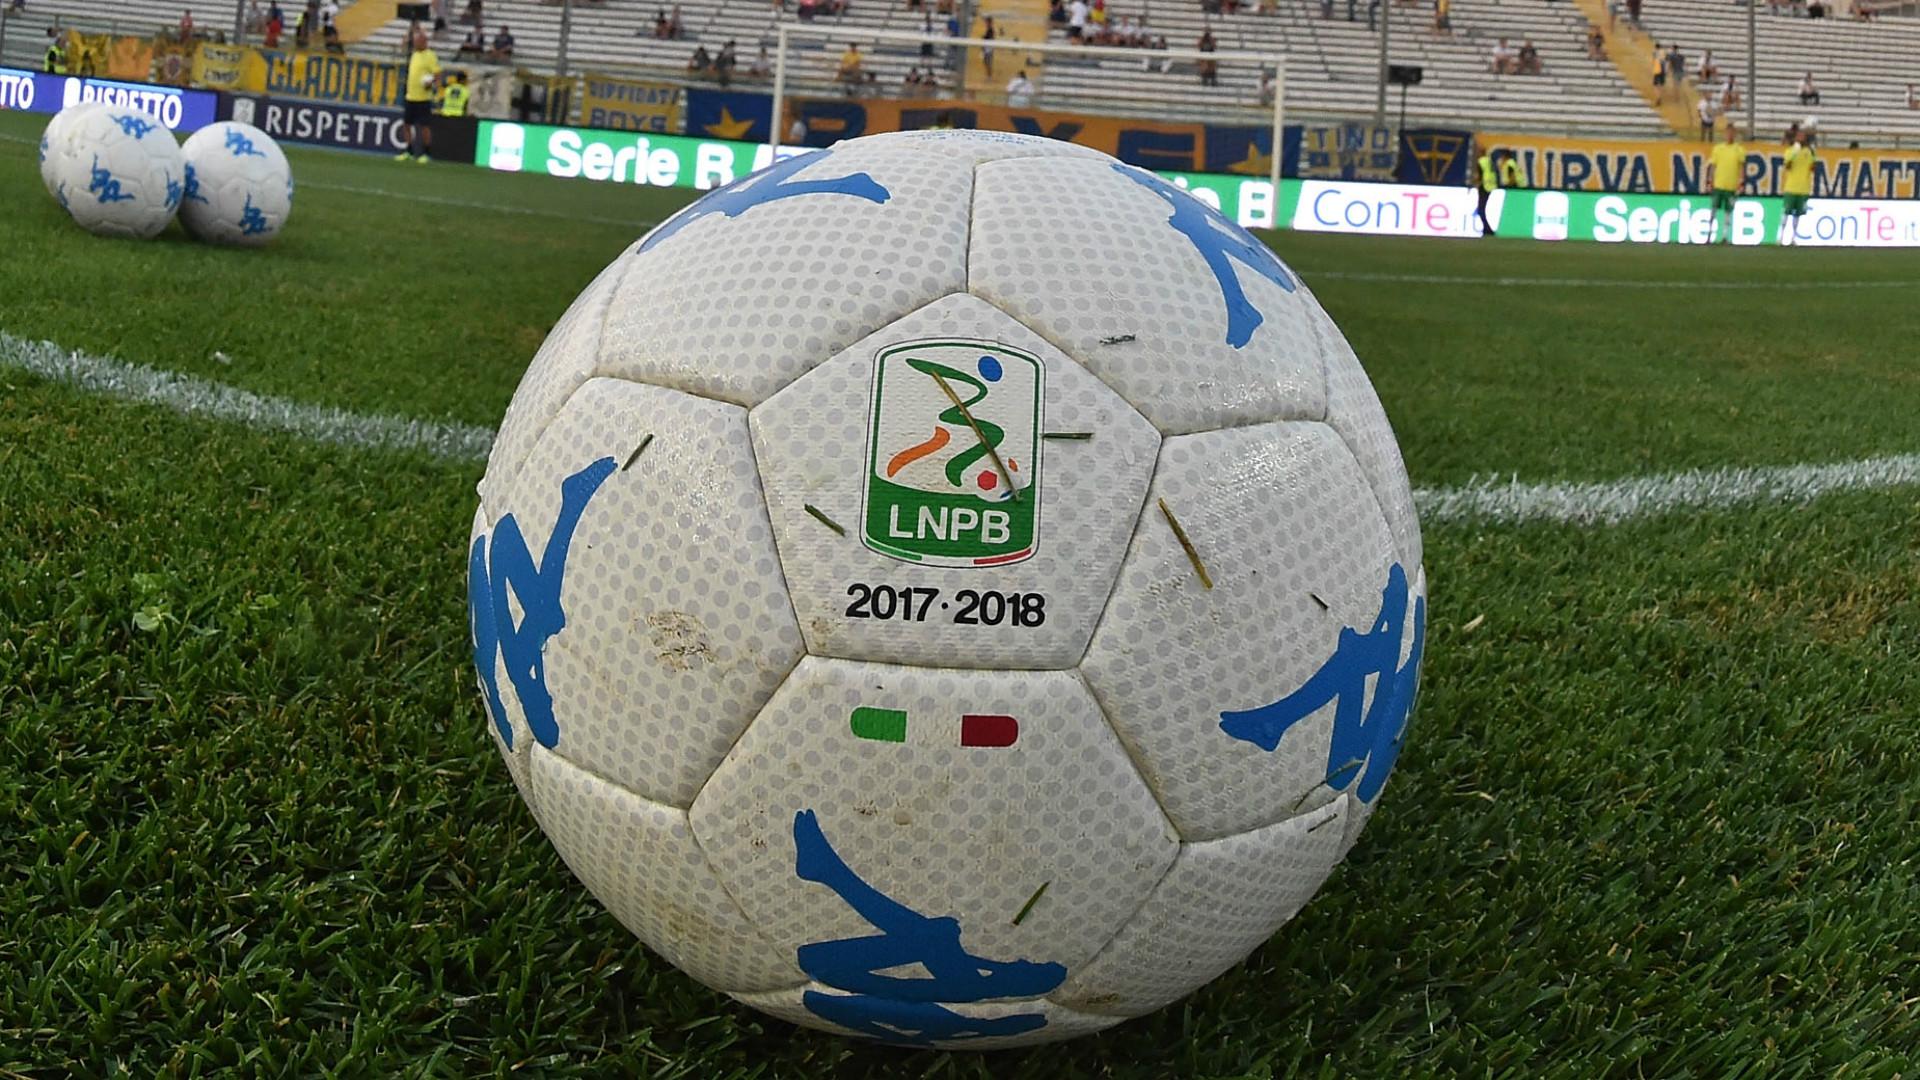 Serie B 2018-2021, corsa a tre per i diritti tv: nuovi orari in vista